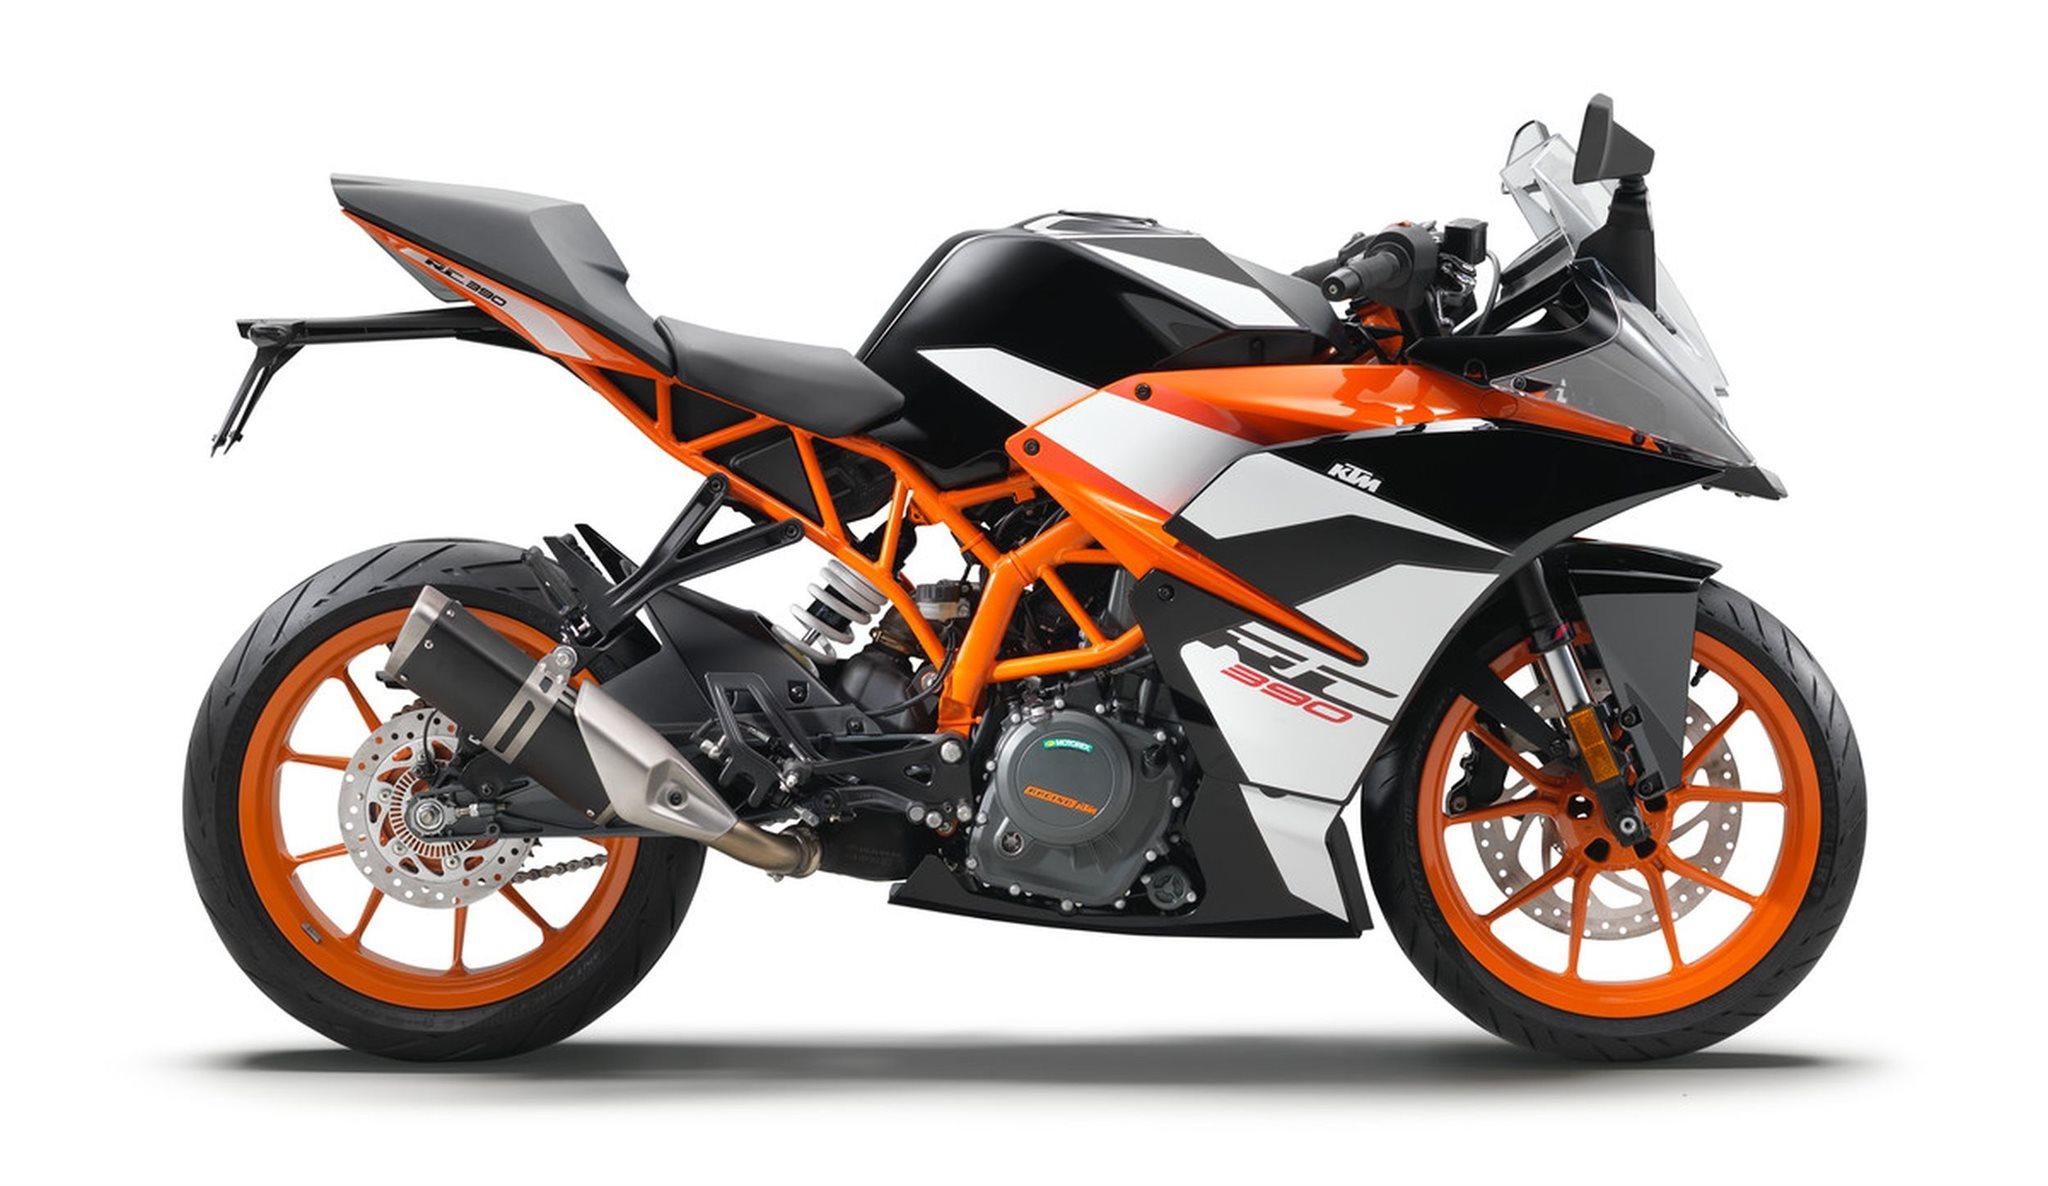 verleihmotorrad ktm rc 390 vom h ndler meister motorcycle. Black Bedroom Furniture Sets. Home Design Ideas